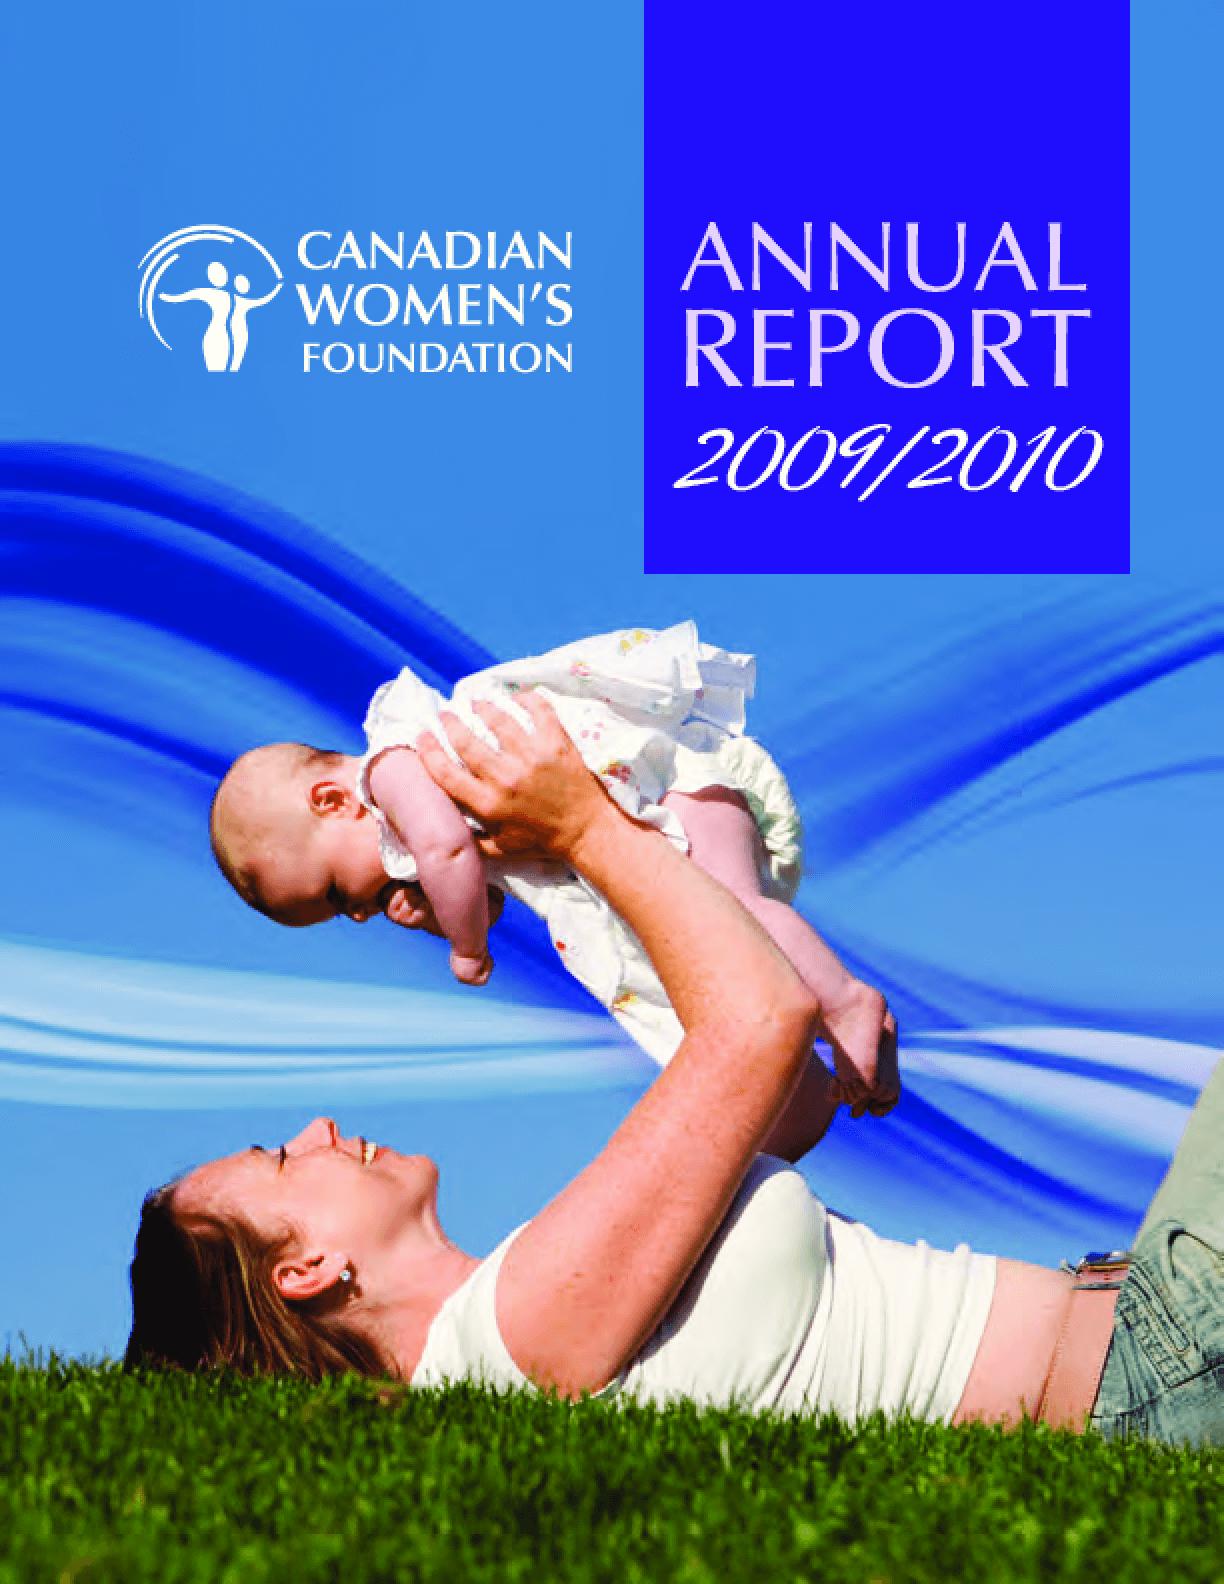 Annual Report 2009/2010